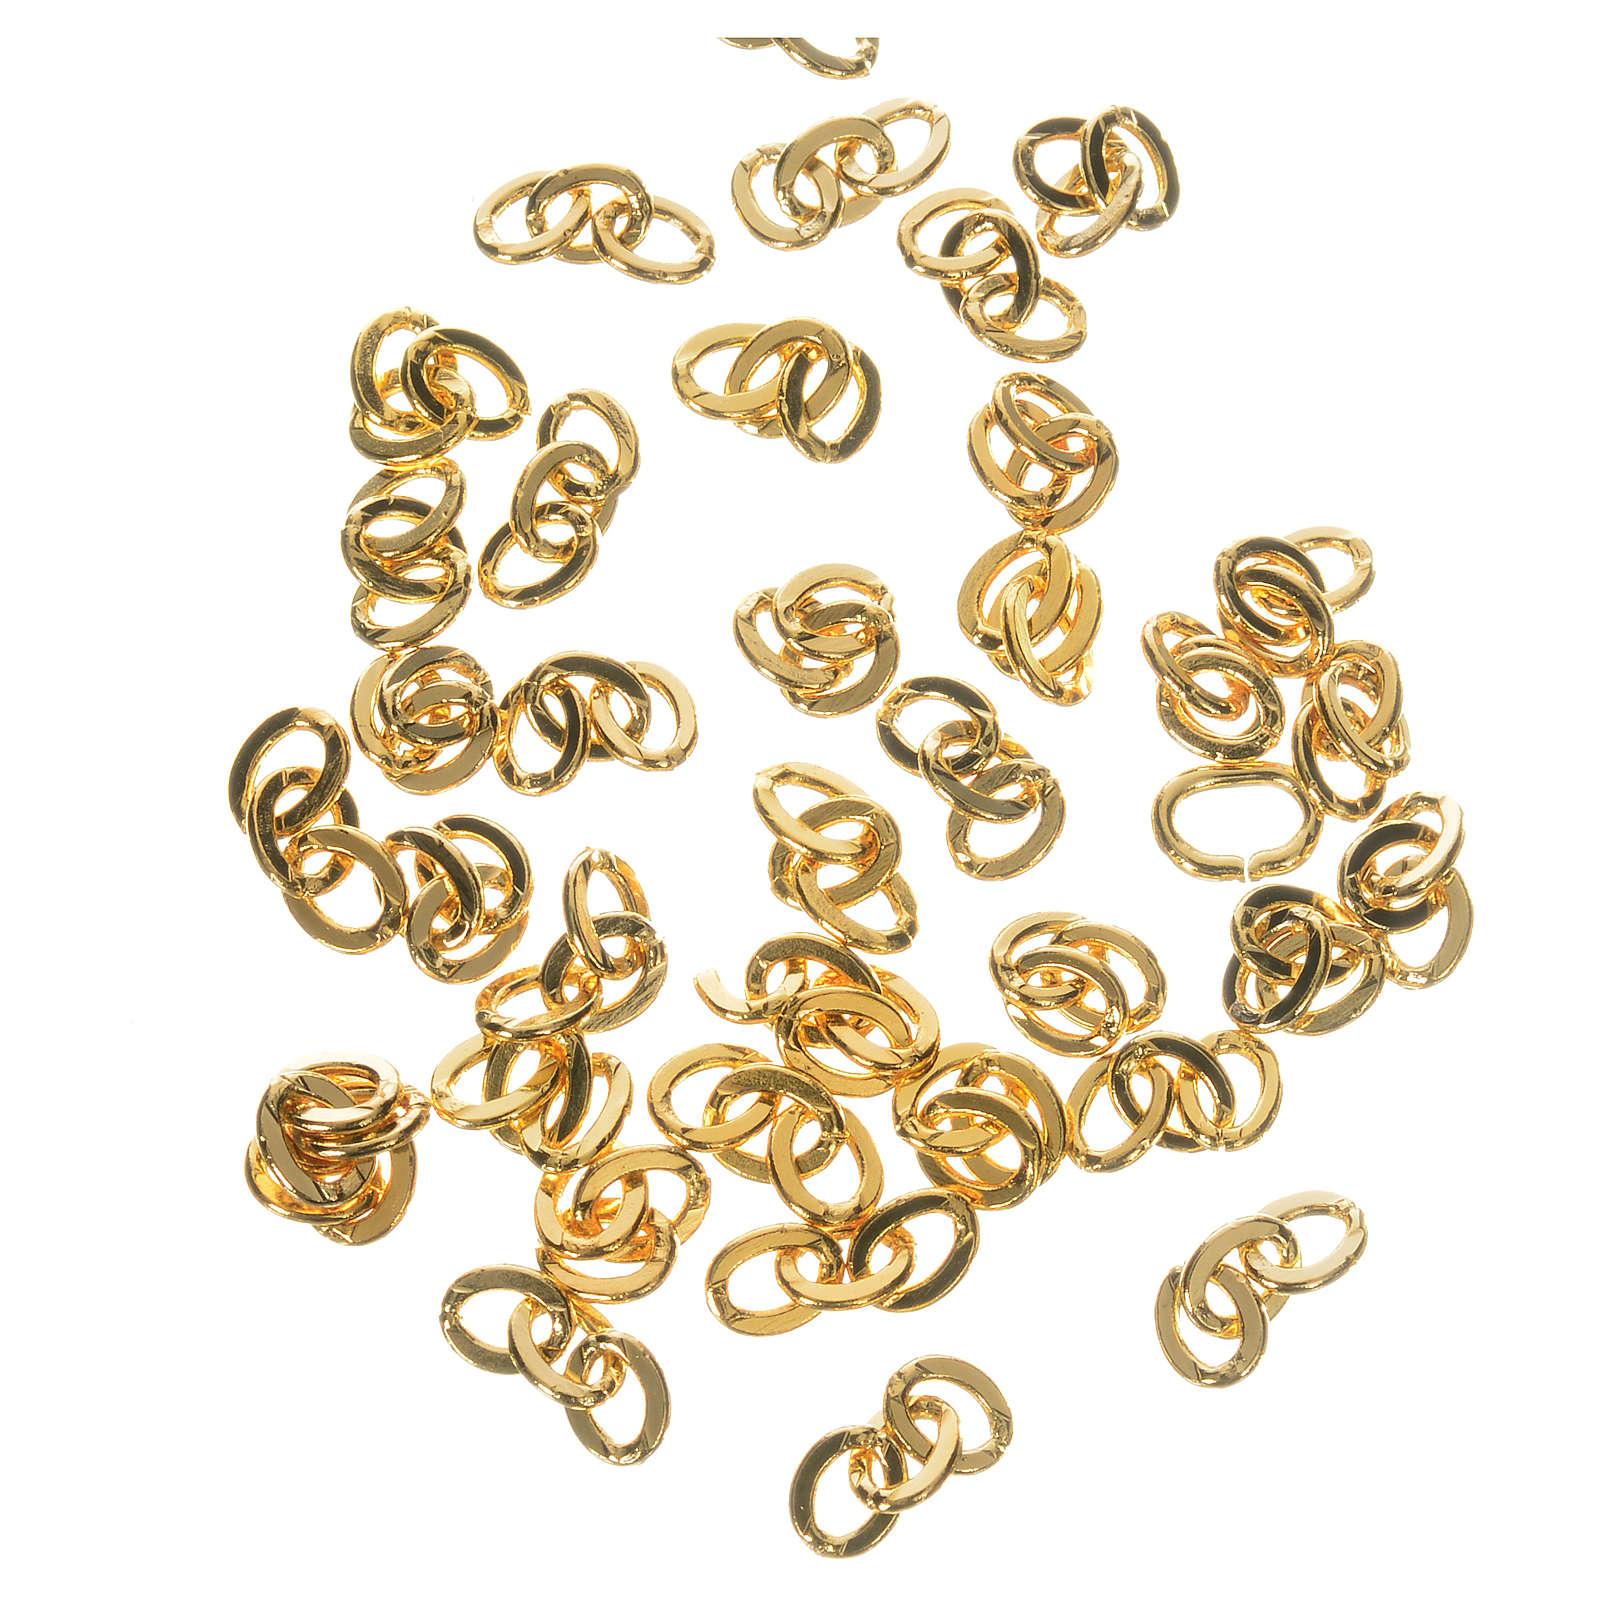 Cadena 3 eslabones de metal dorado 4